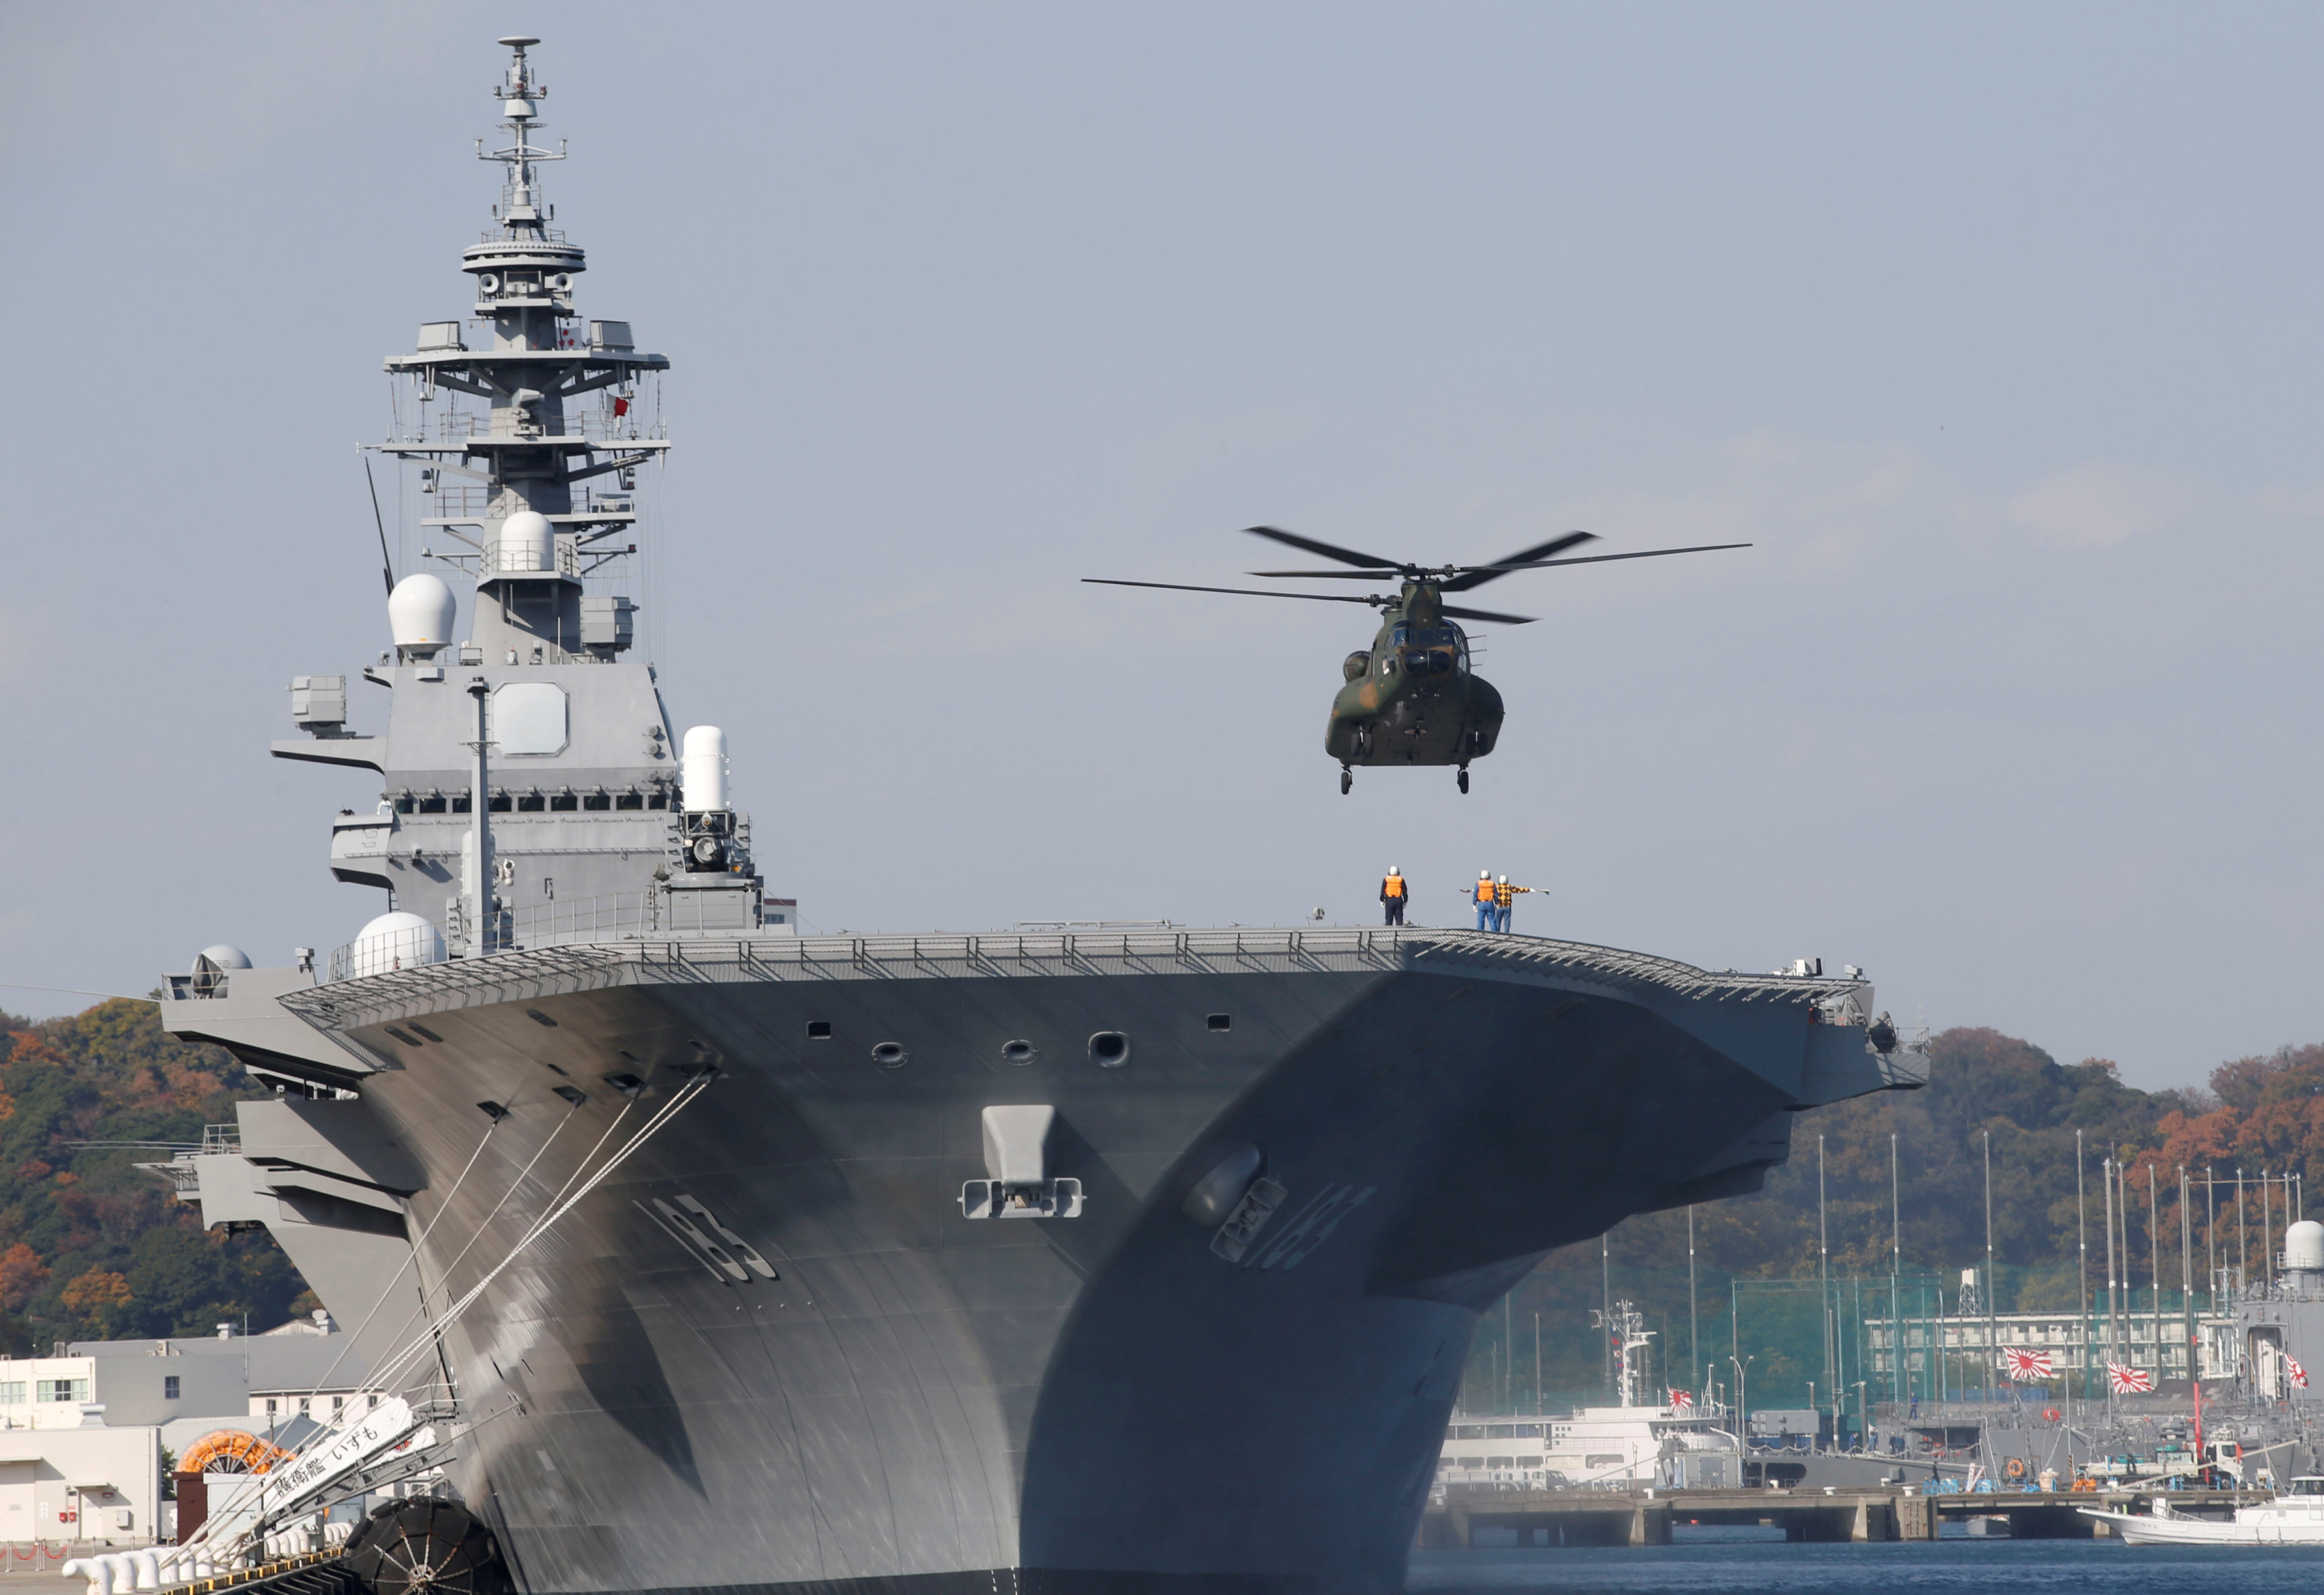 A helicopter lands on the Izumo, Japan Maritime Self Defense Force's (JMSDF) helicopter carrier, at JMSDF Yokosuka base in Yokosuka, south of Tokyo, Japan onDec. 6, 2016. (REUTERS/Kim Kyung-Hoon)